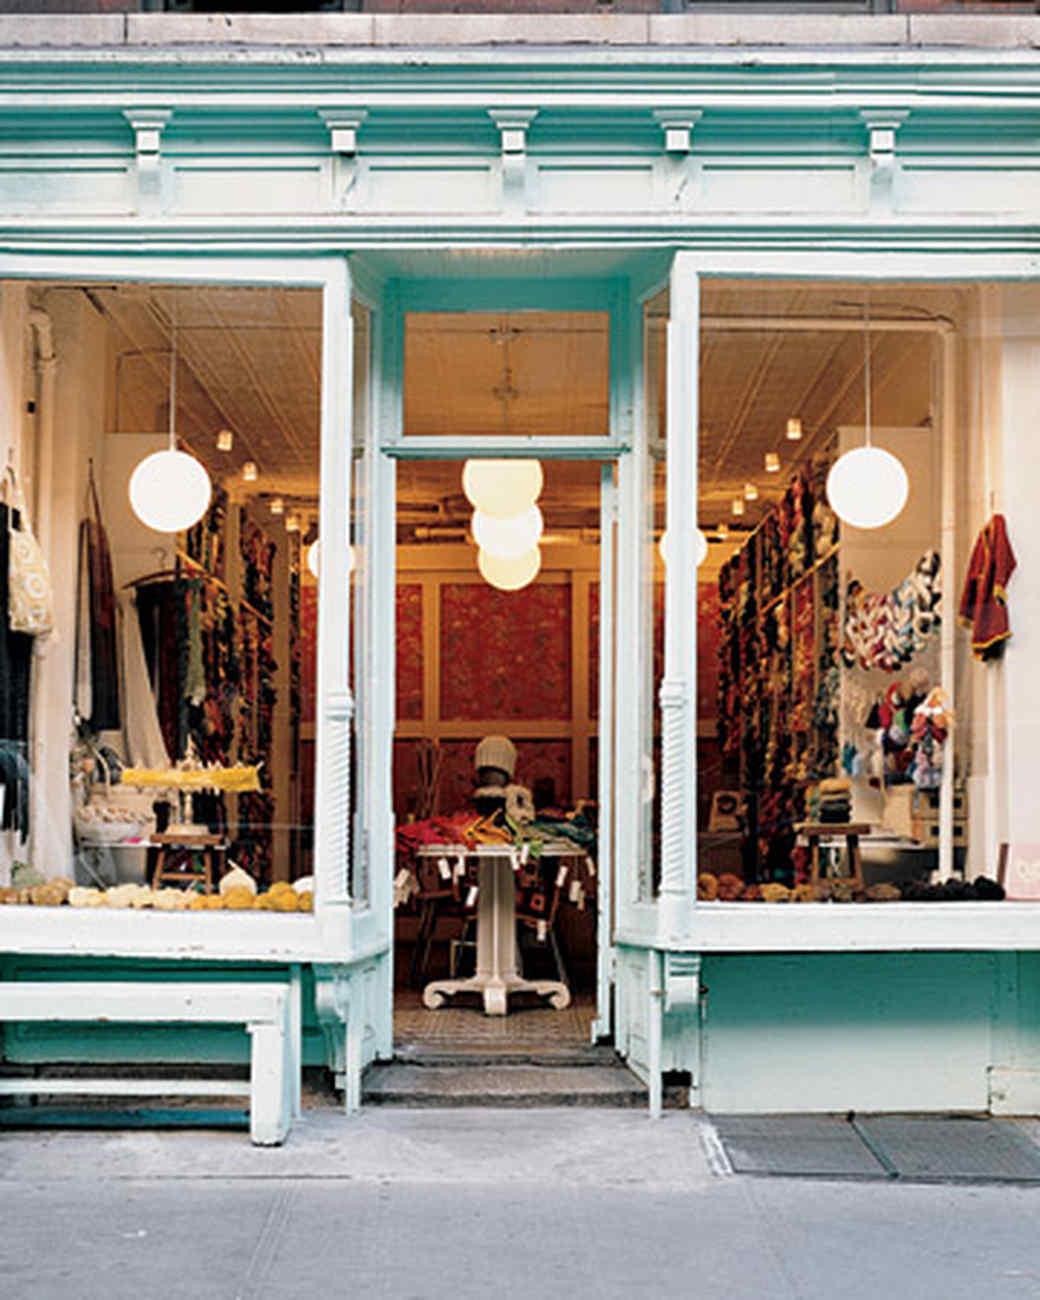 pa102972_0507_storefront.jpg